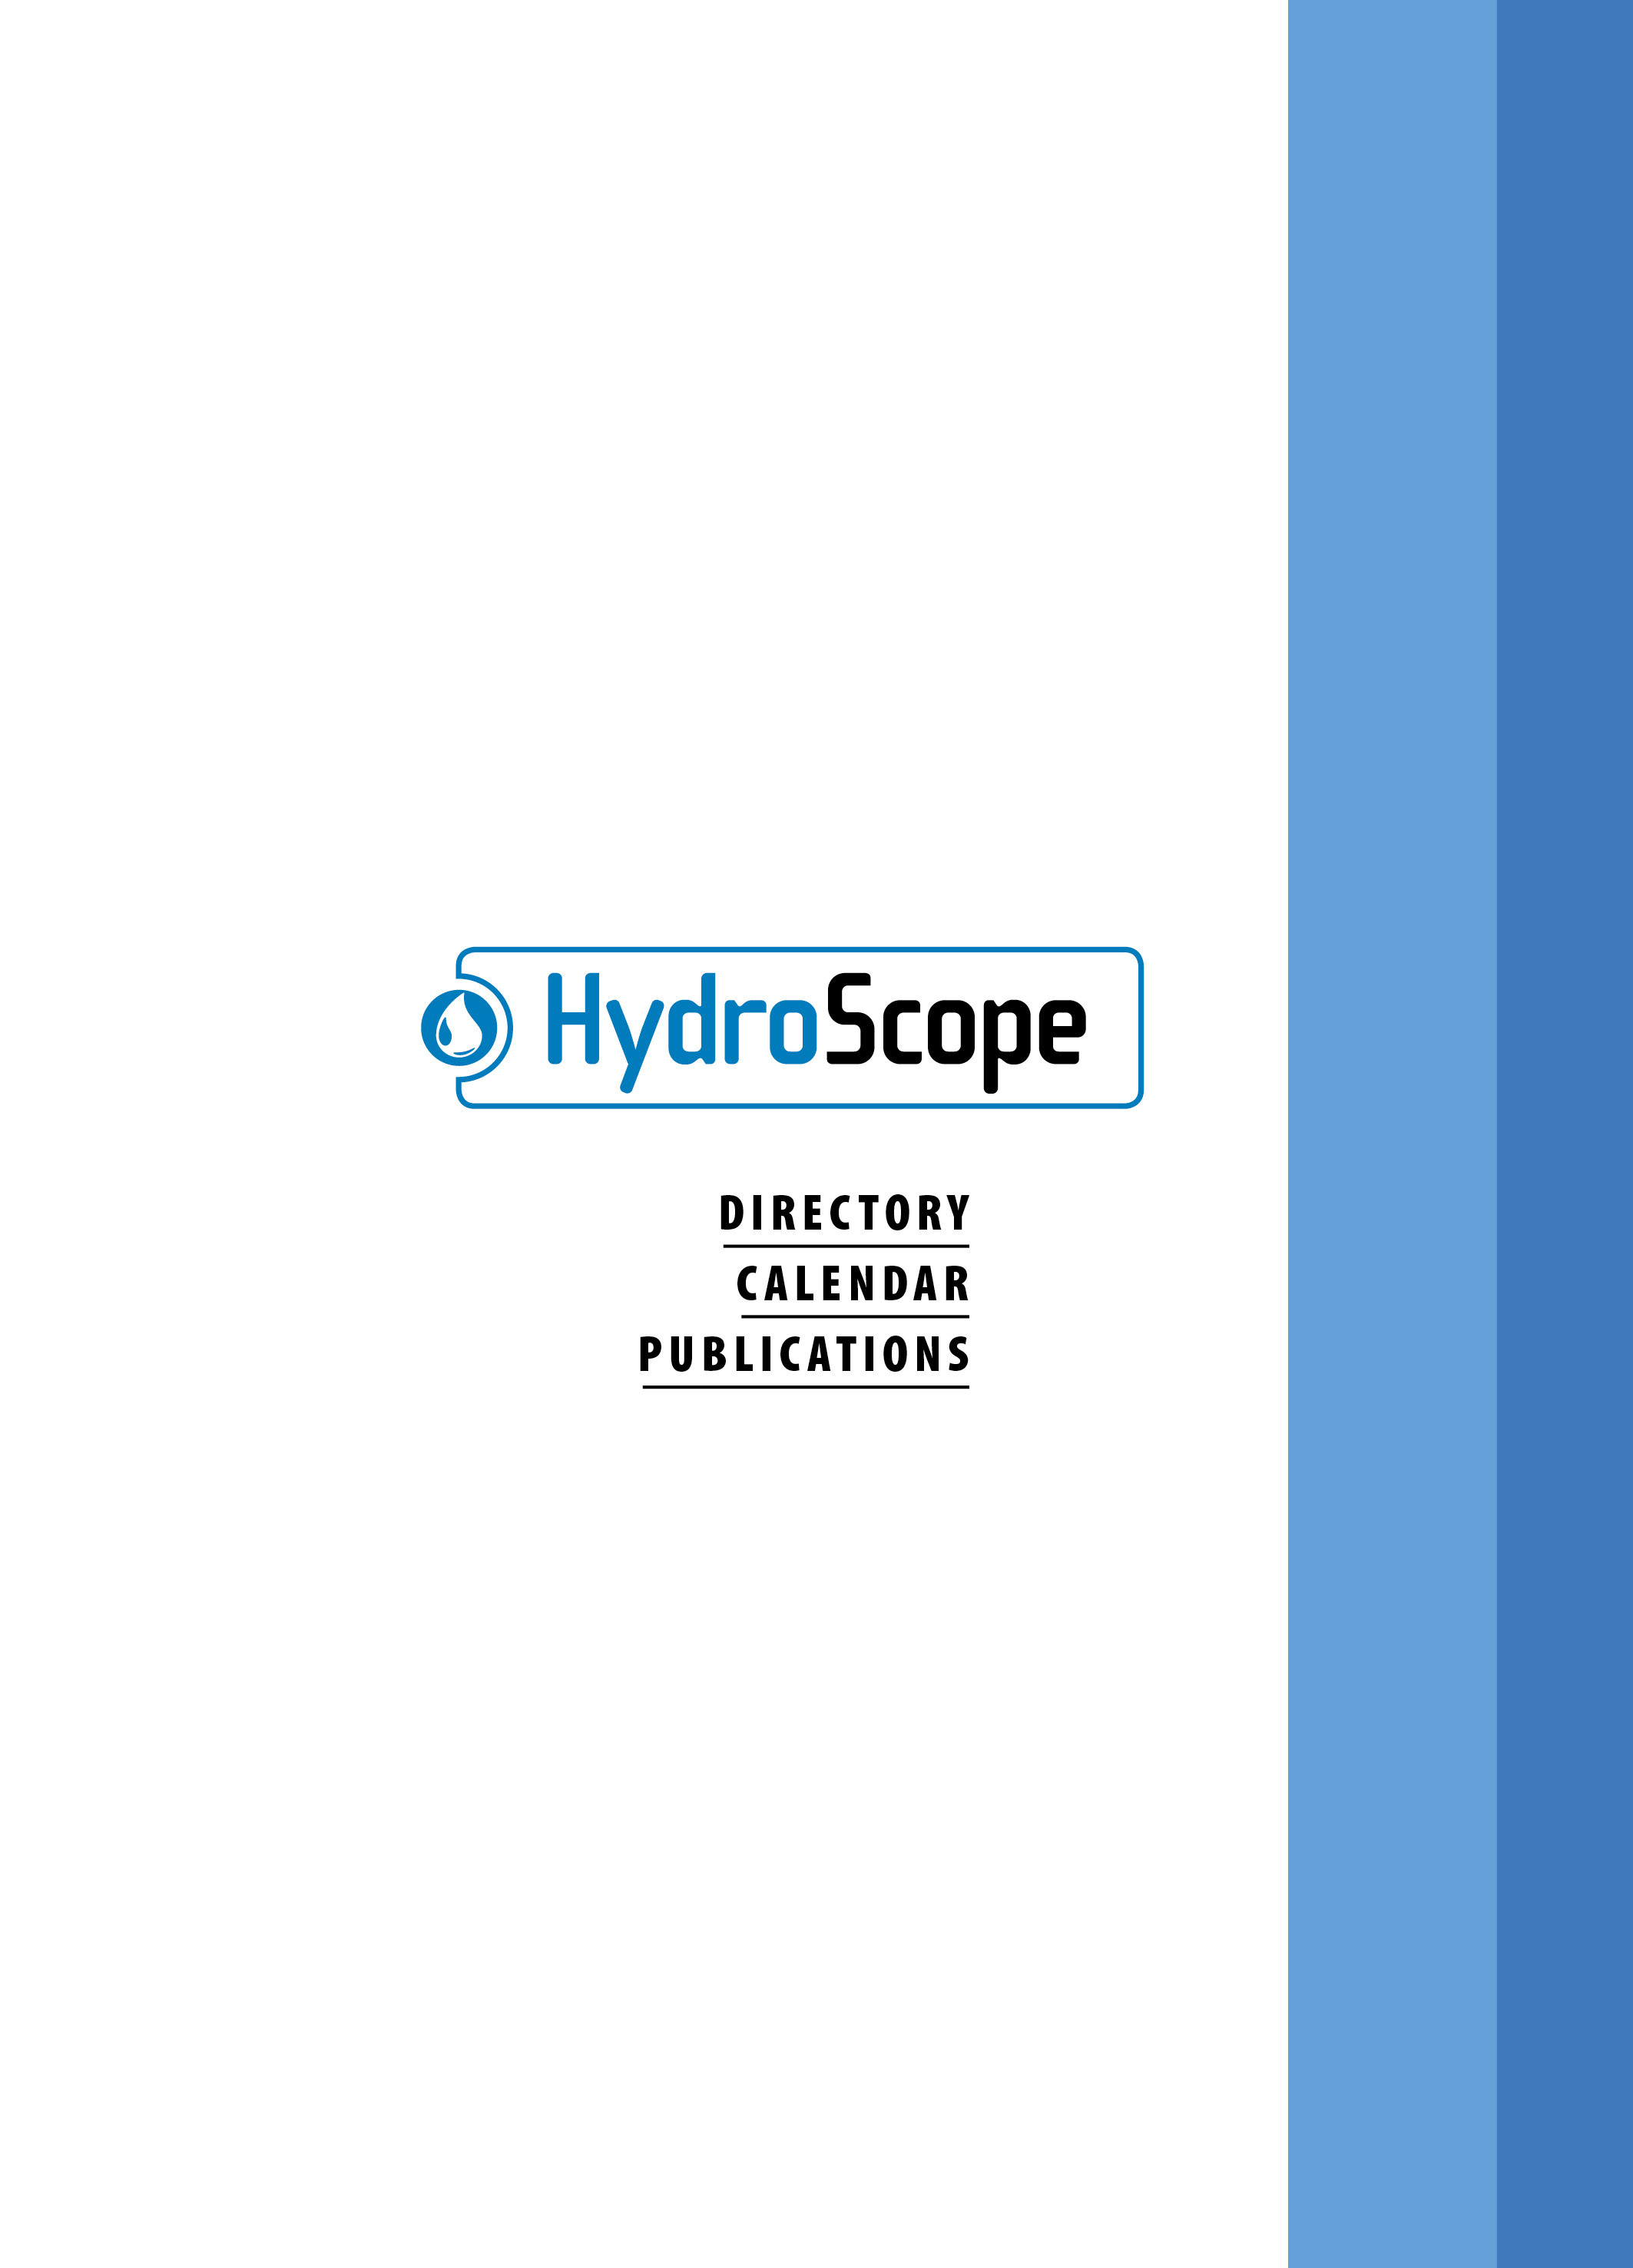 HydroScope anglais 2015-2016